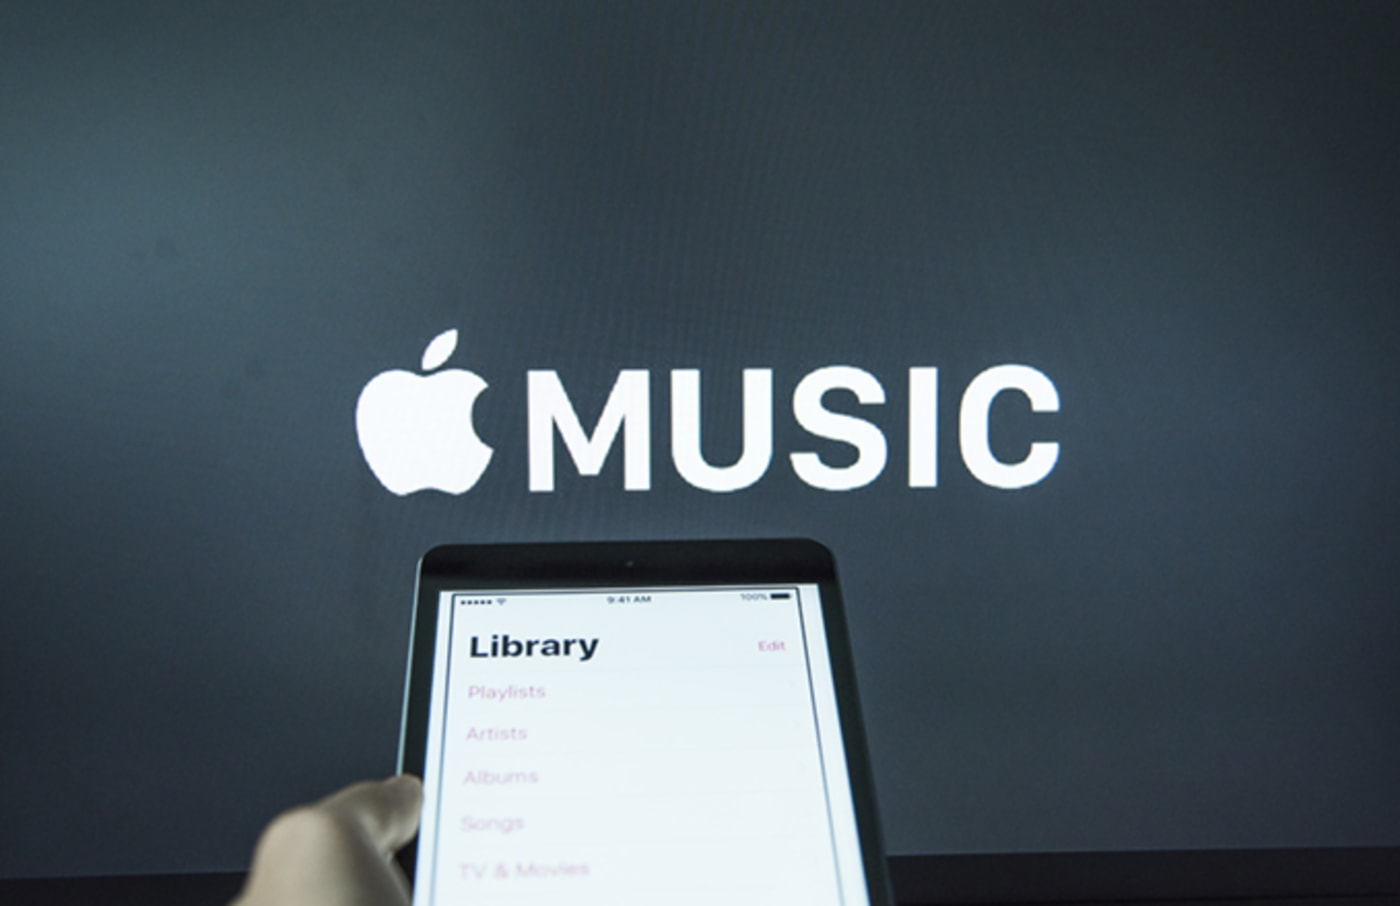 apple music getty s3 studio